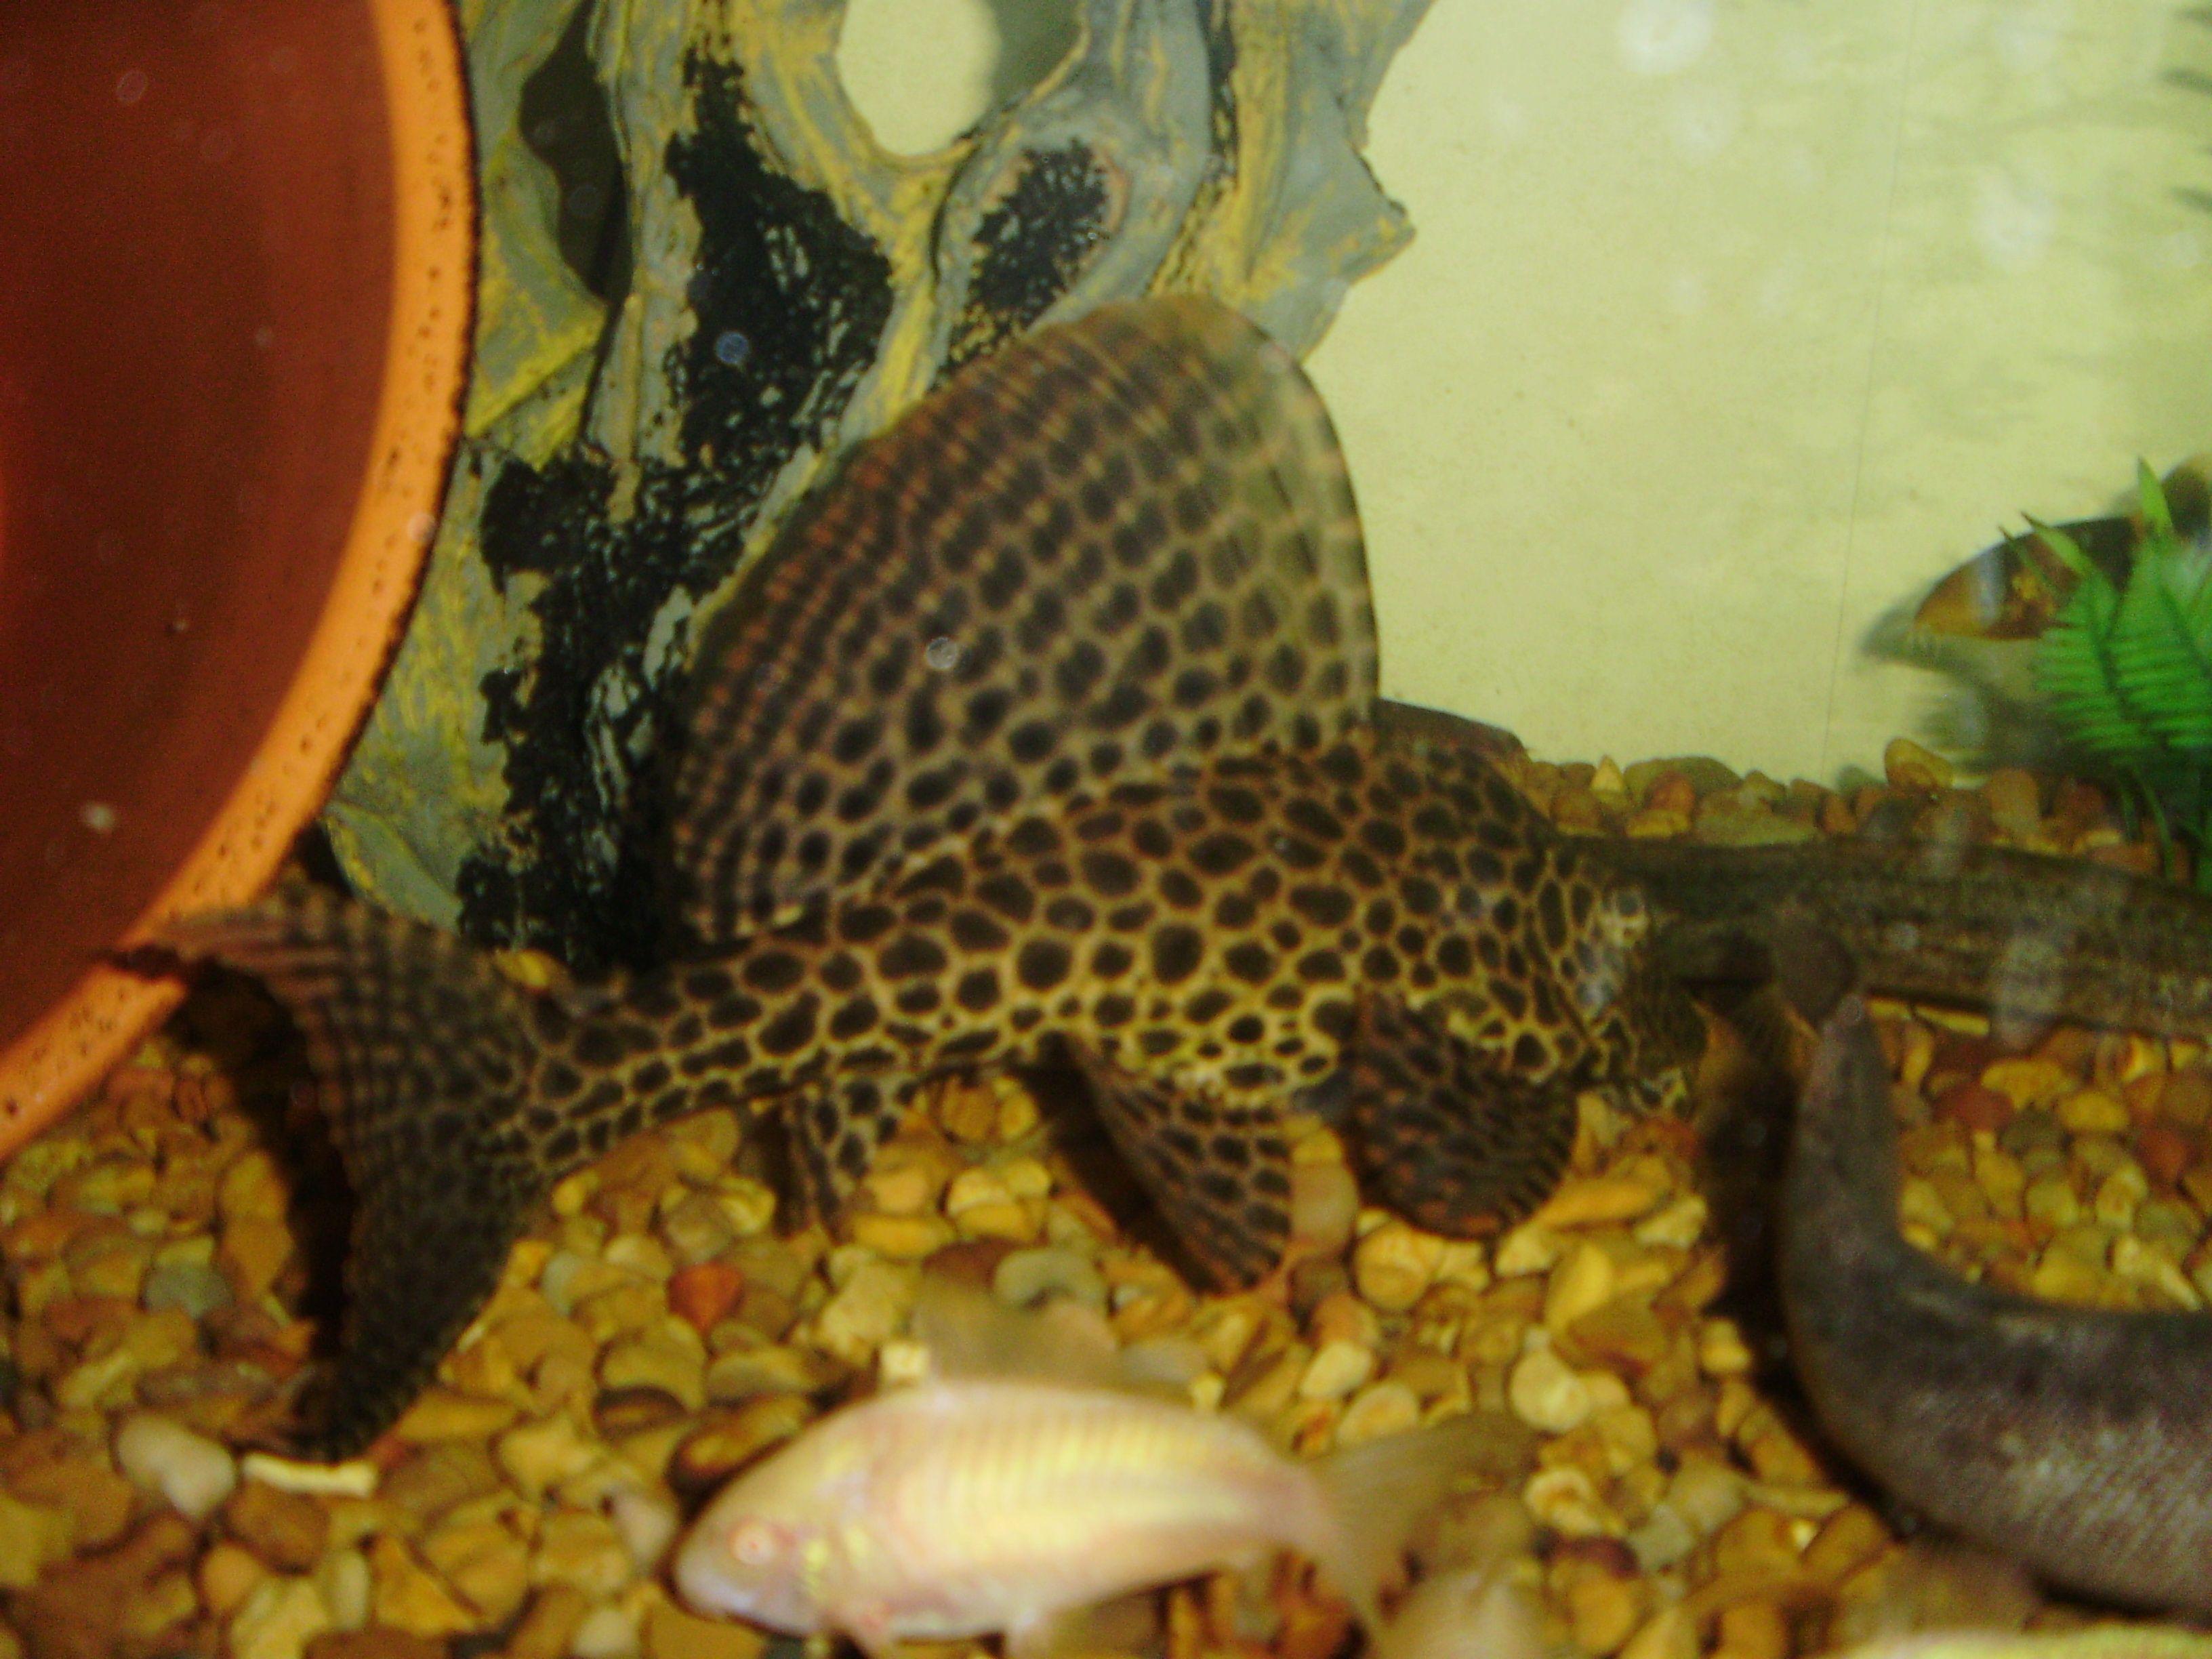 Freshwater aquarium fish breeding - How To Breed Plecostomus